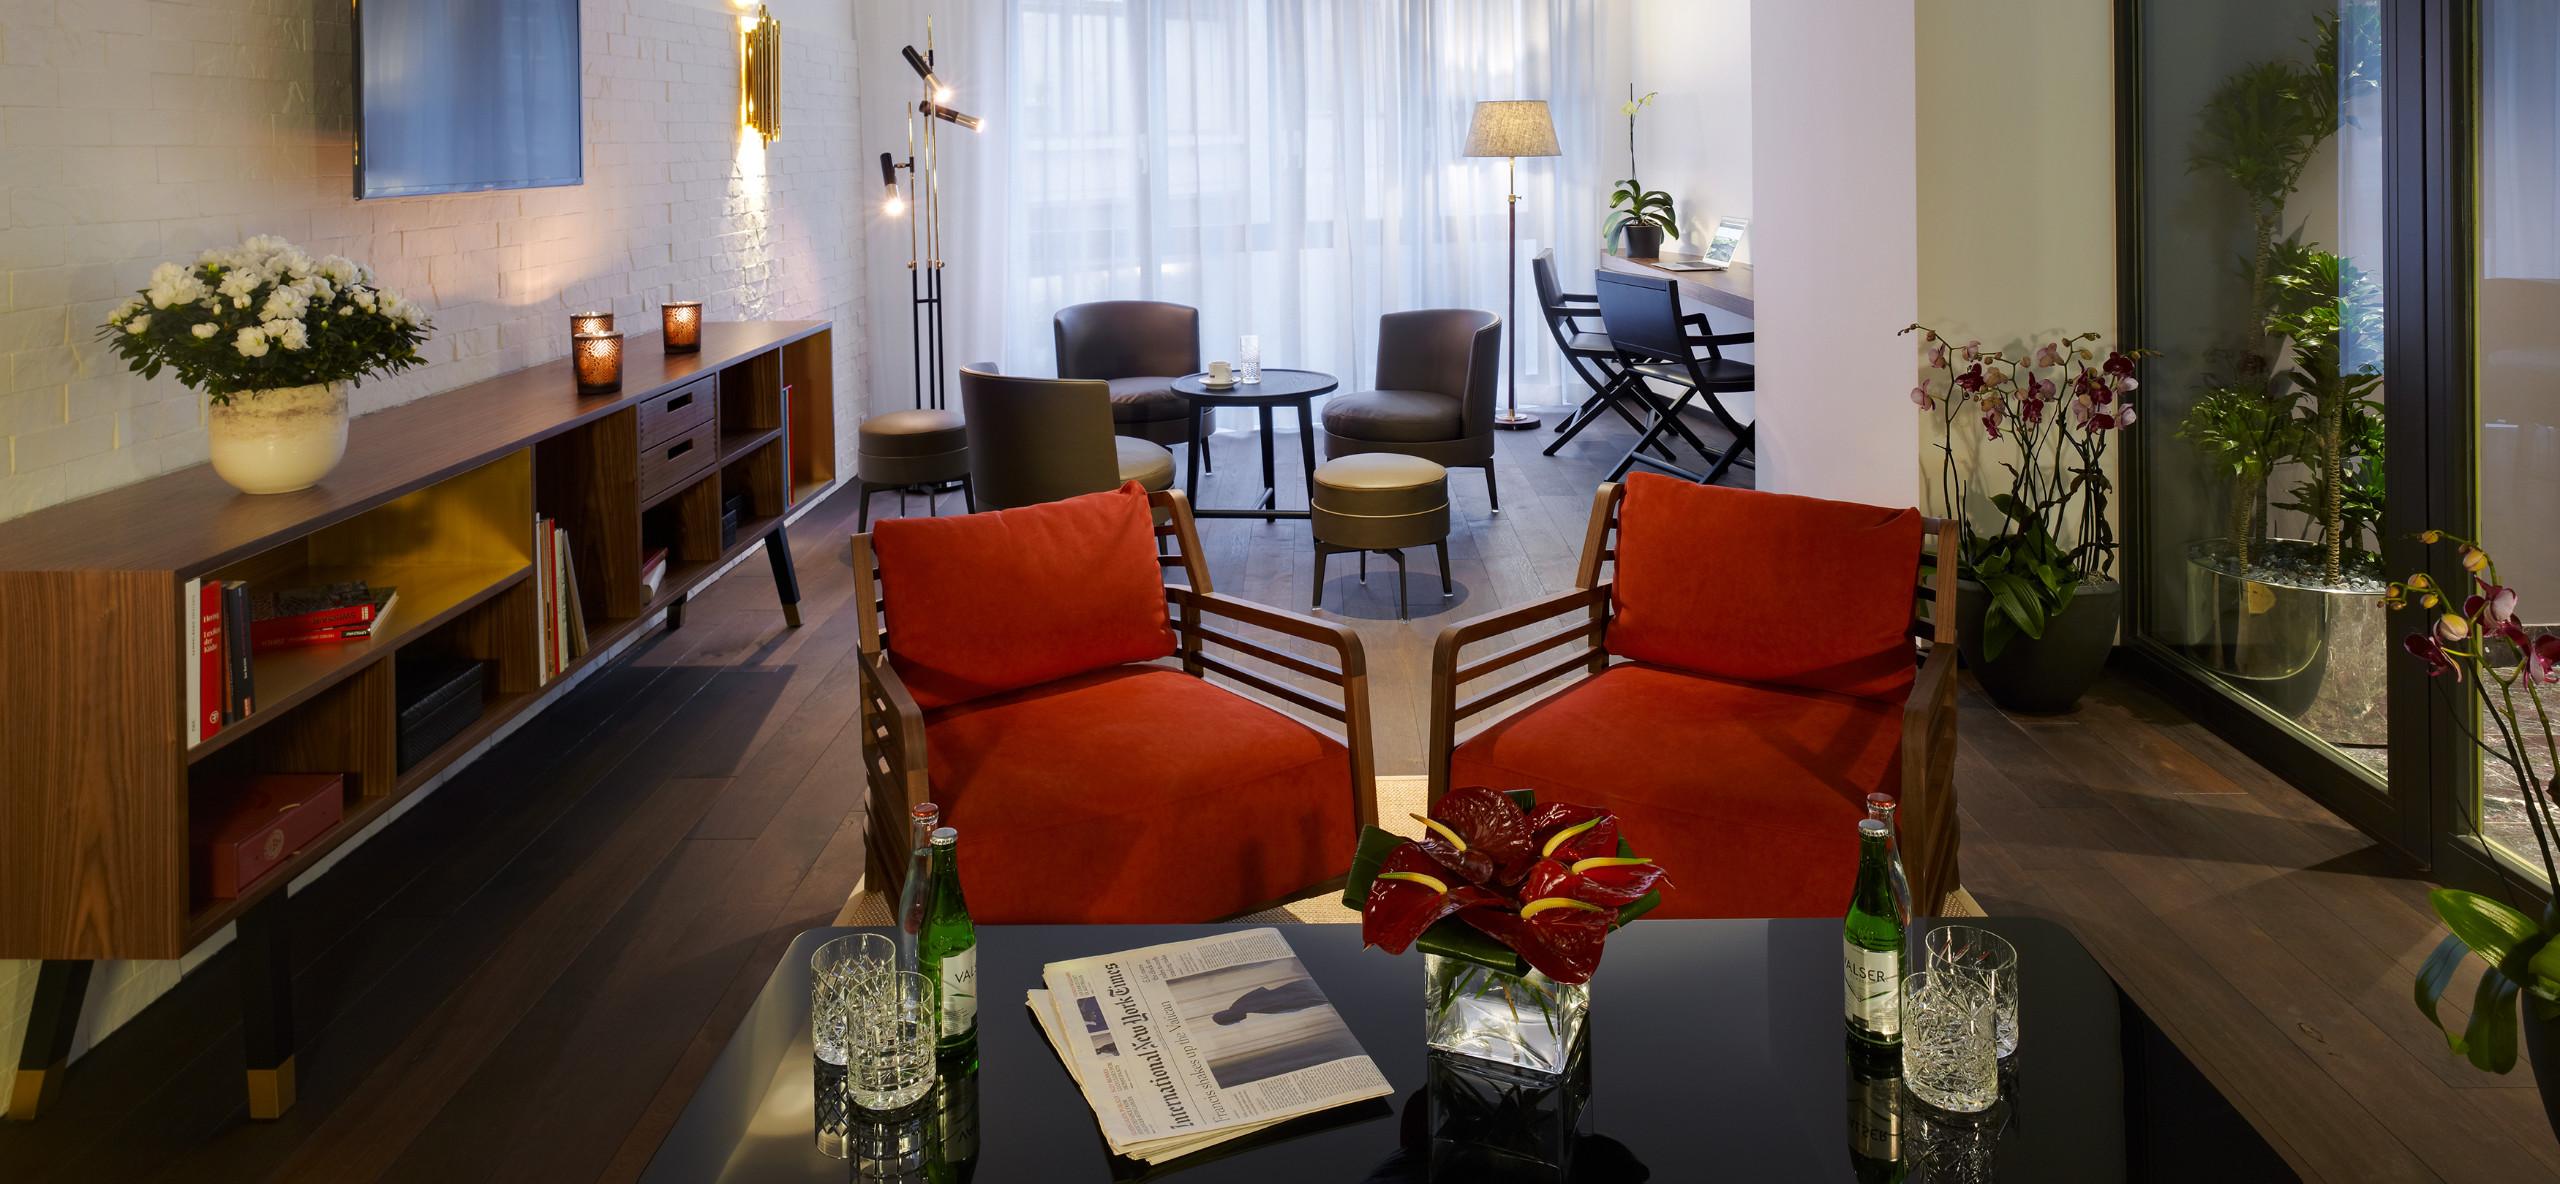 Hotel City Zürich *** Superior Boutique Hotel Lounge